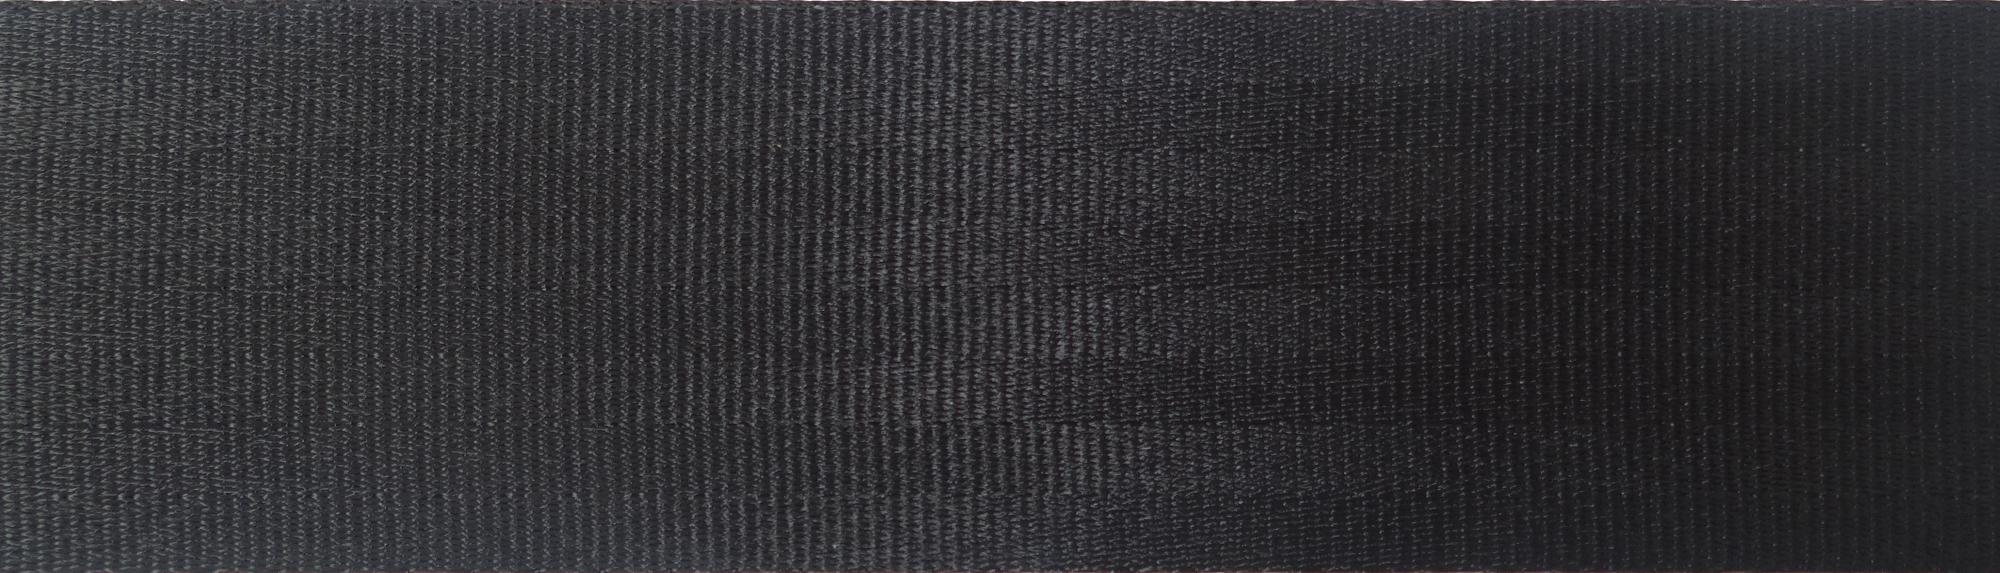 8 Panel Black